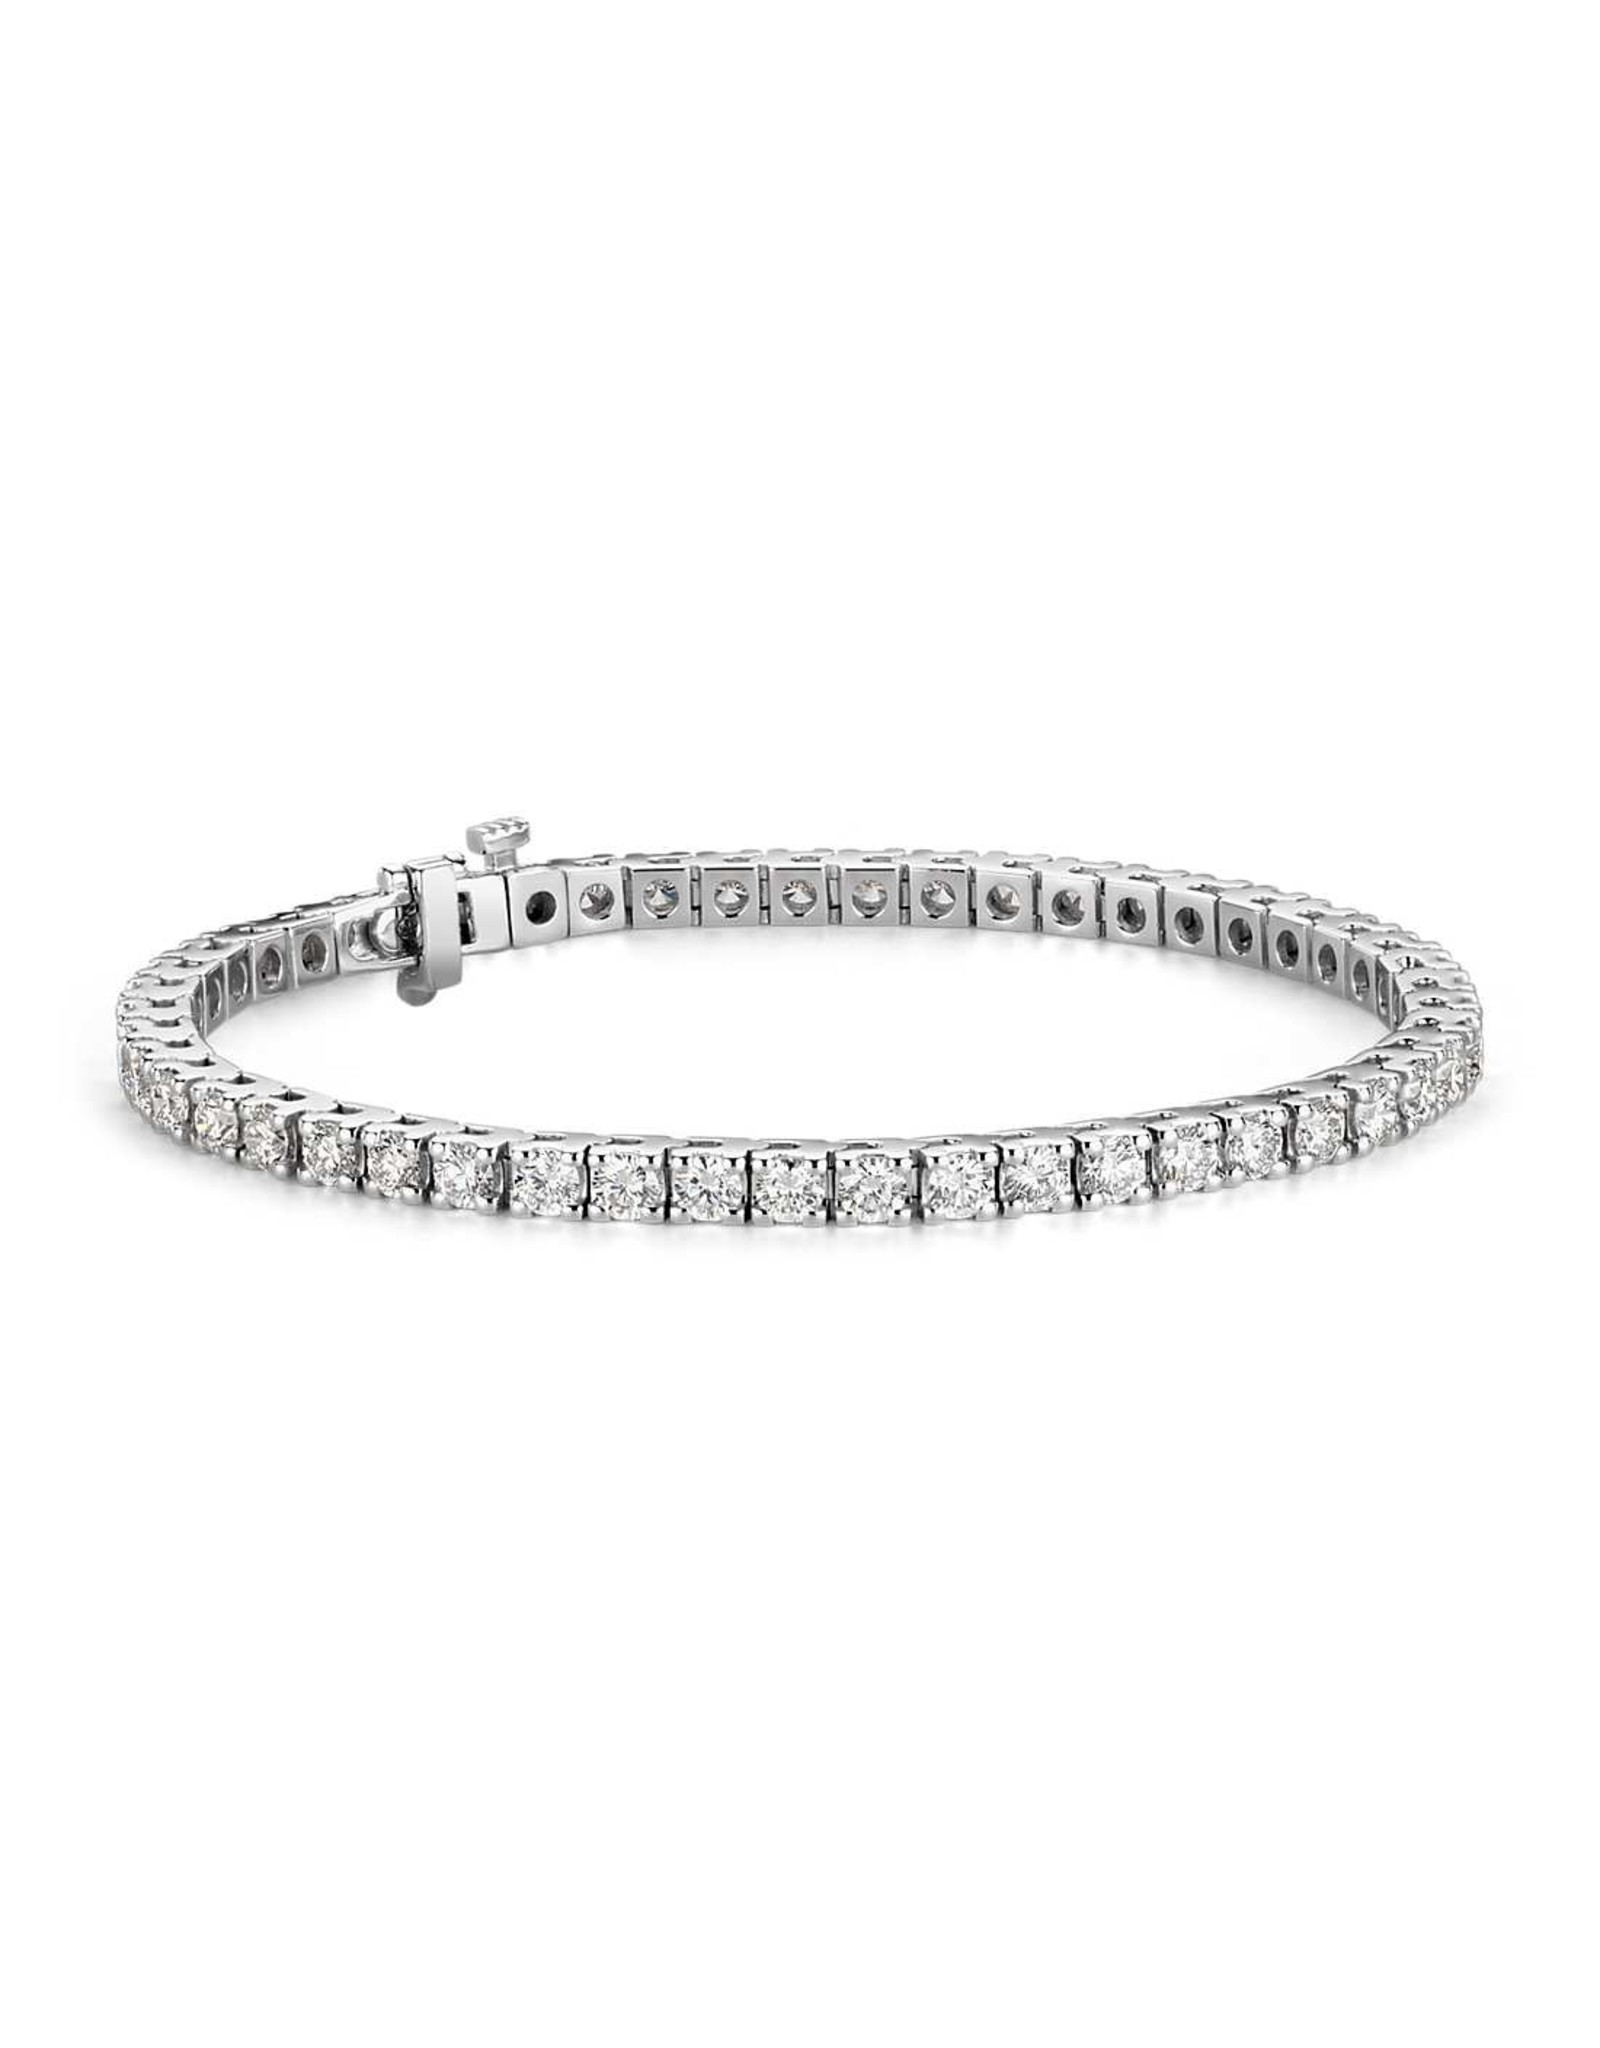 14K White Gold Classic Diamond Tennis Bracelet, D: 5.07ct